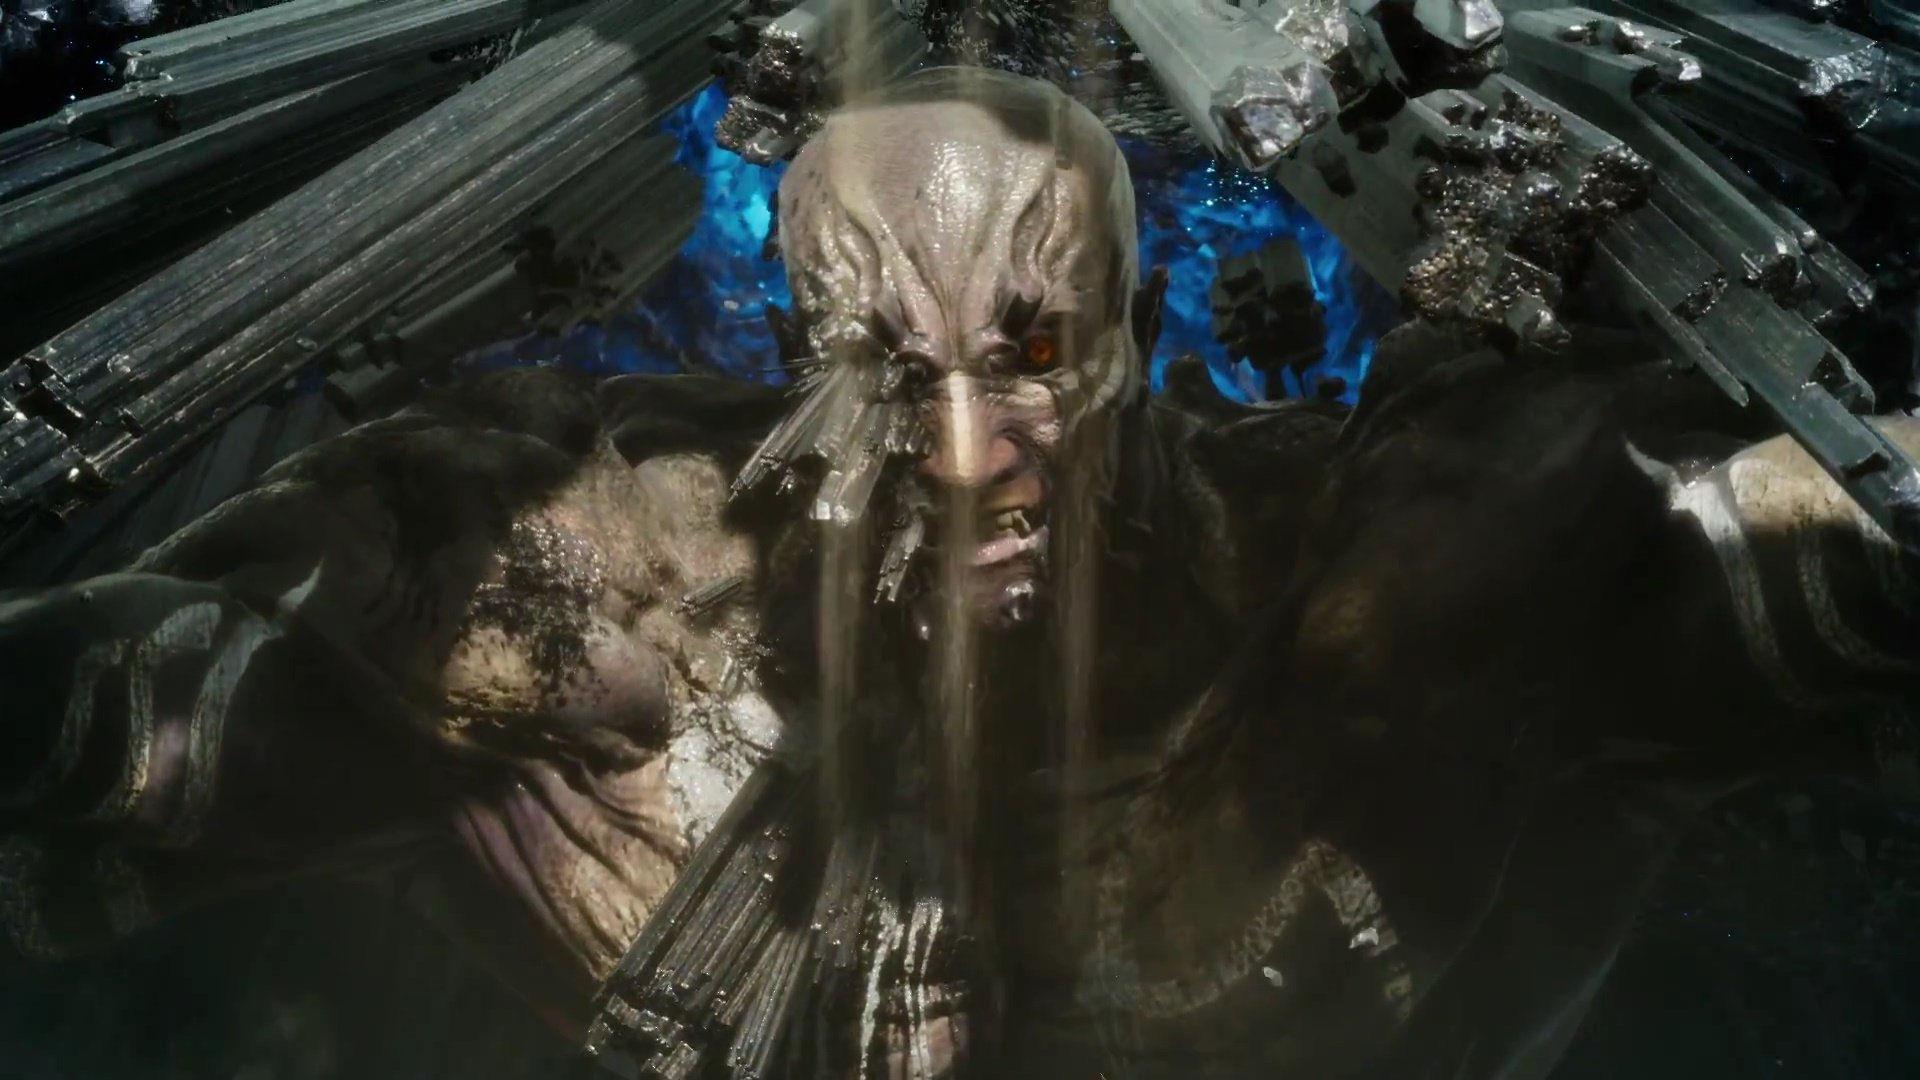 titan final fantasy xv final fantasy wiki fandom powered by